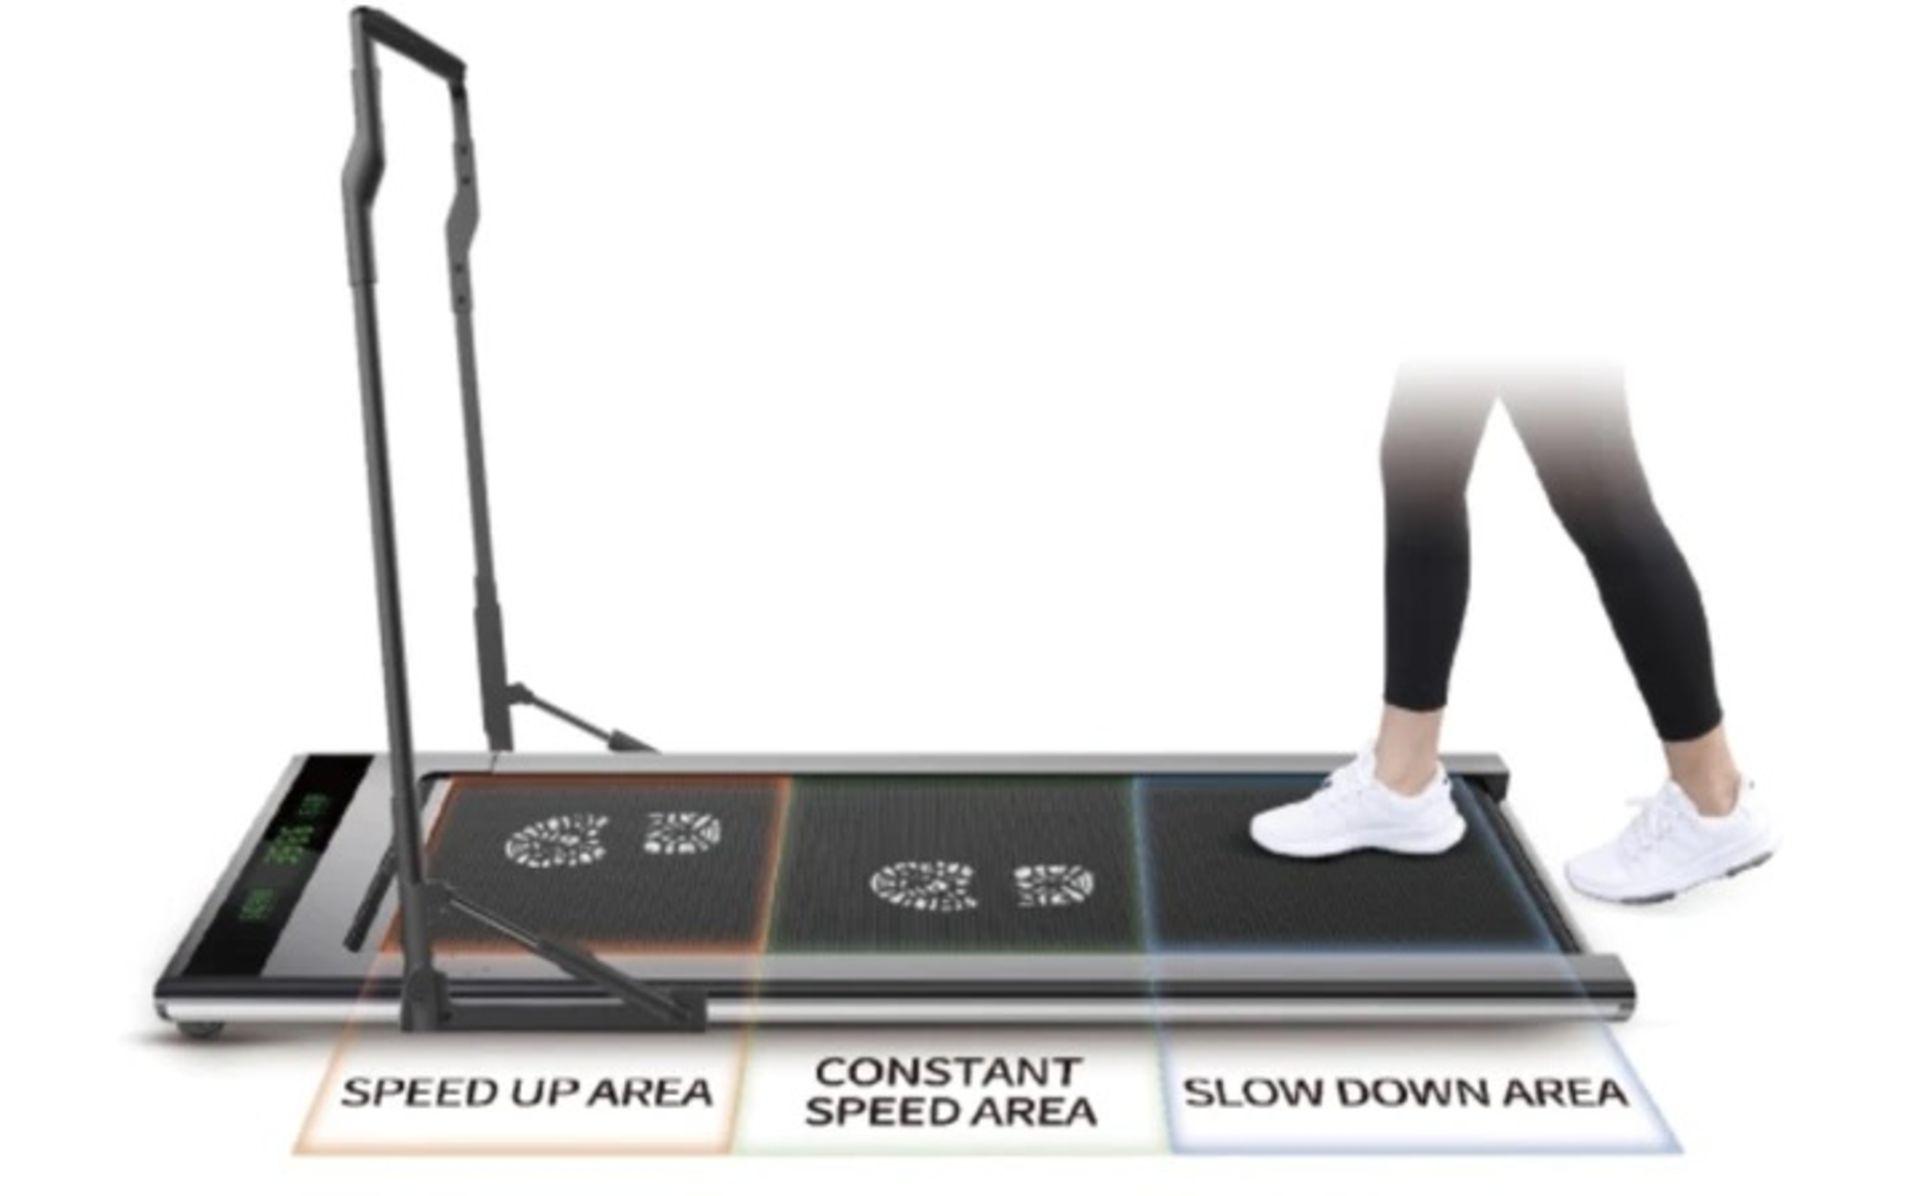 1 x Slim Tread Ultra Thin Smart Treadmill Running / Walking Machine - Lightweight With Folding - Image 14 of 23